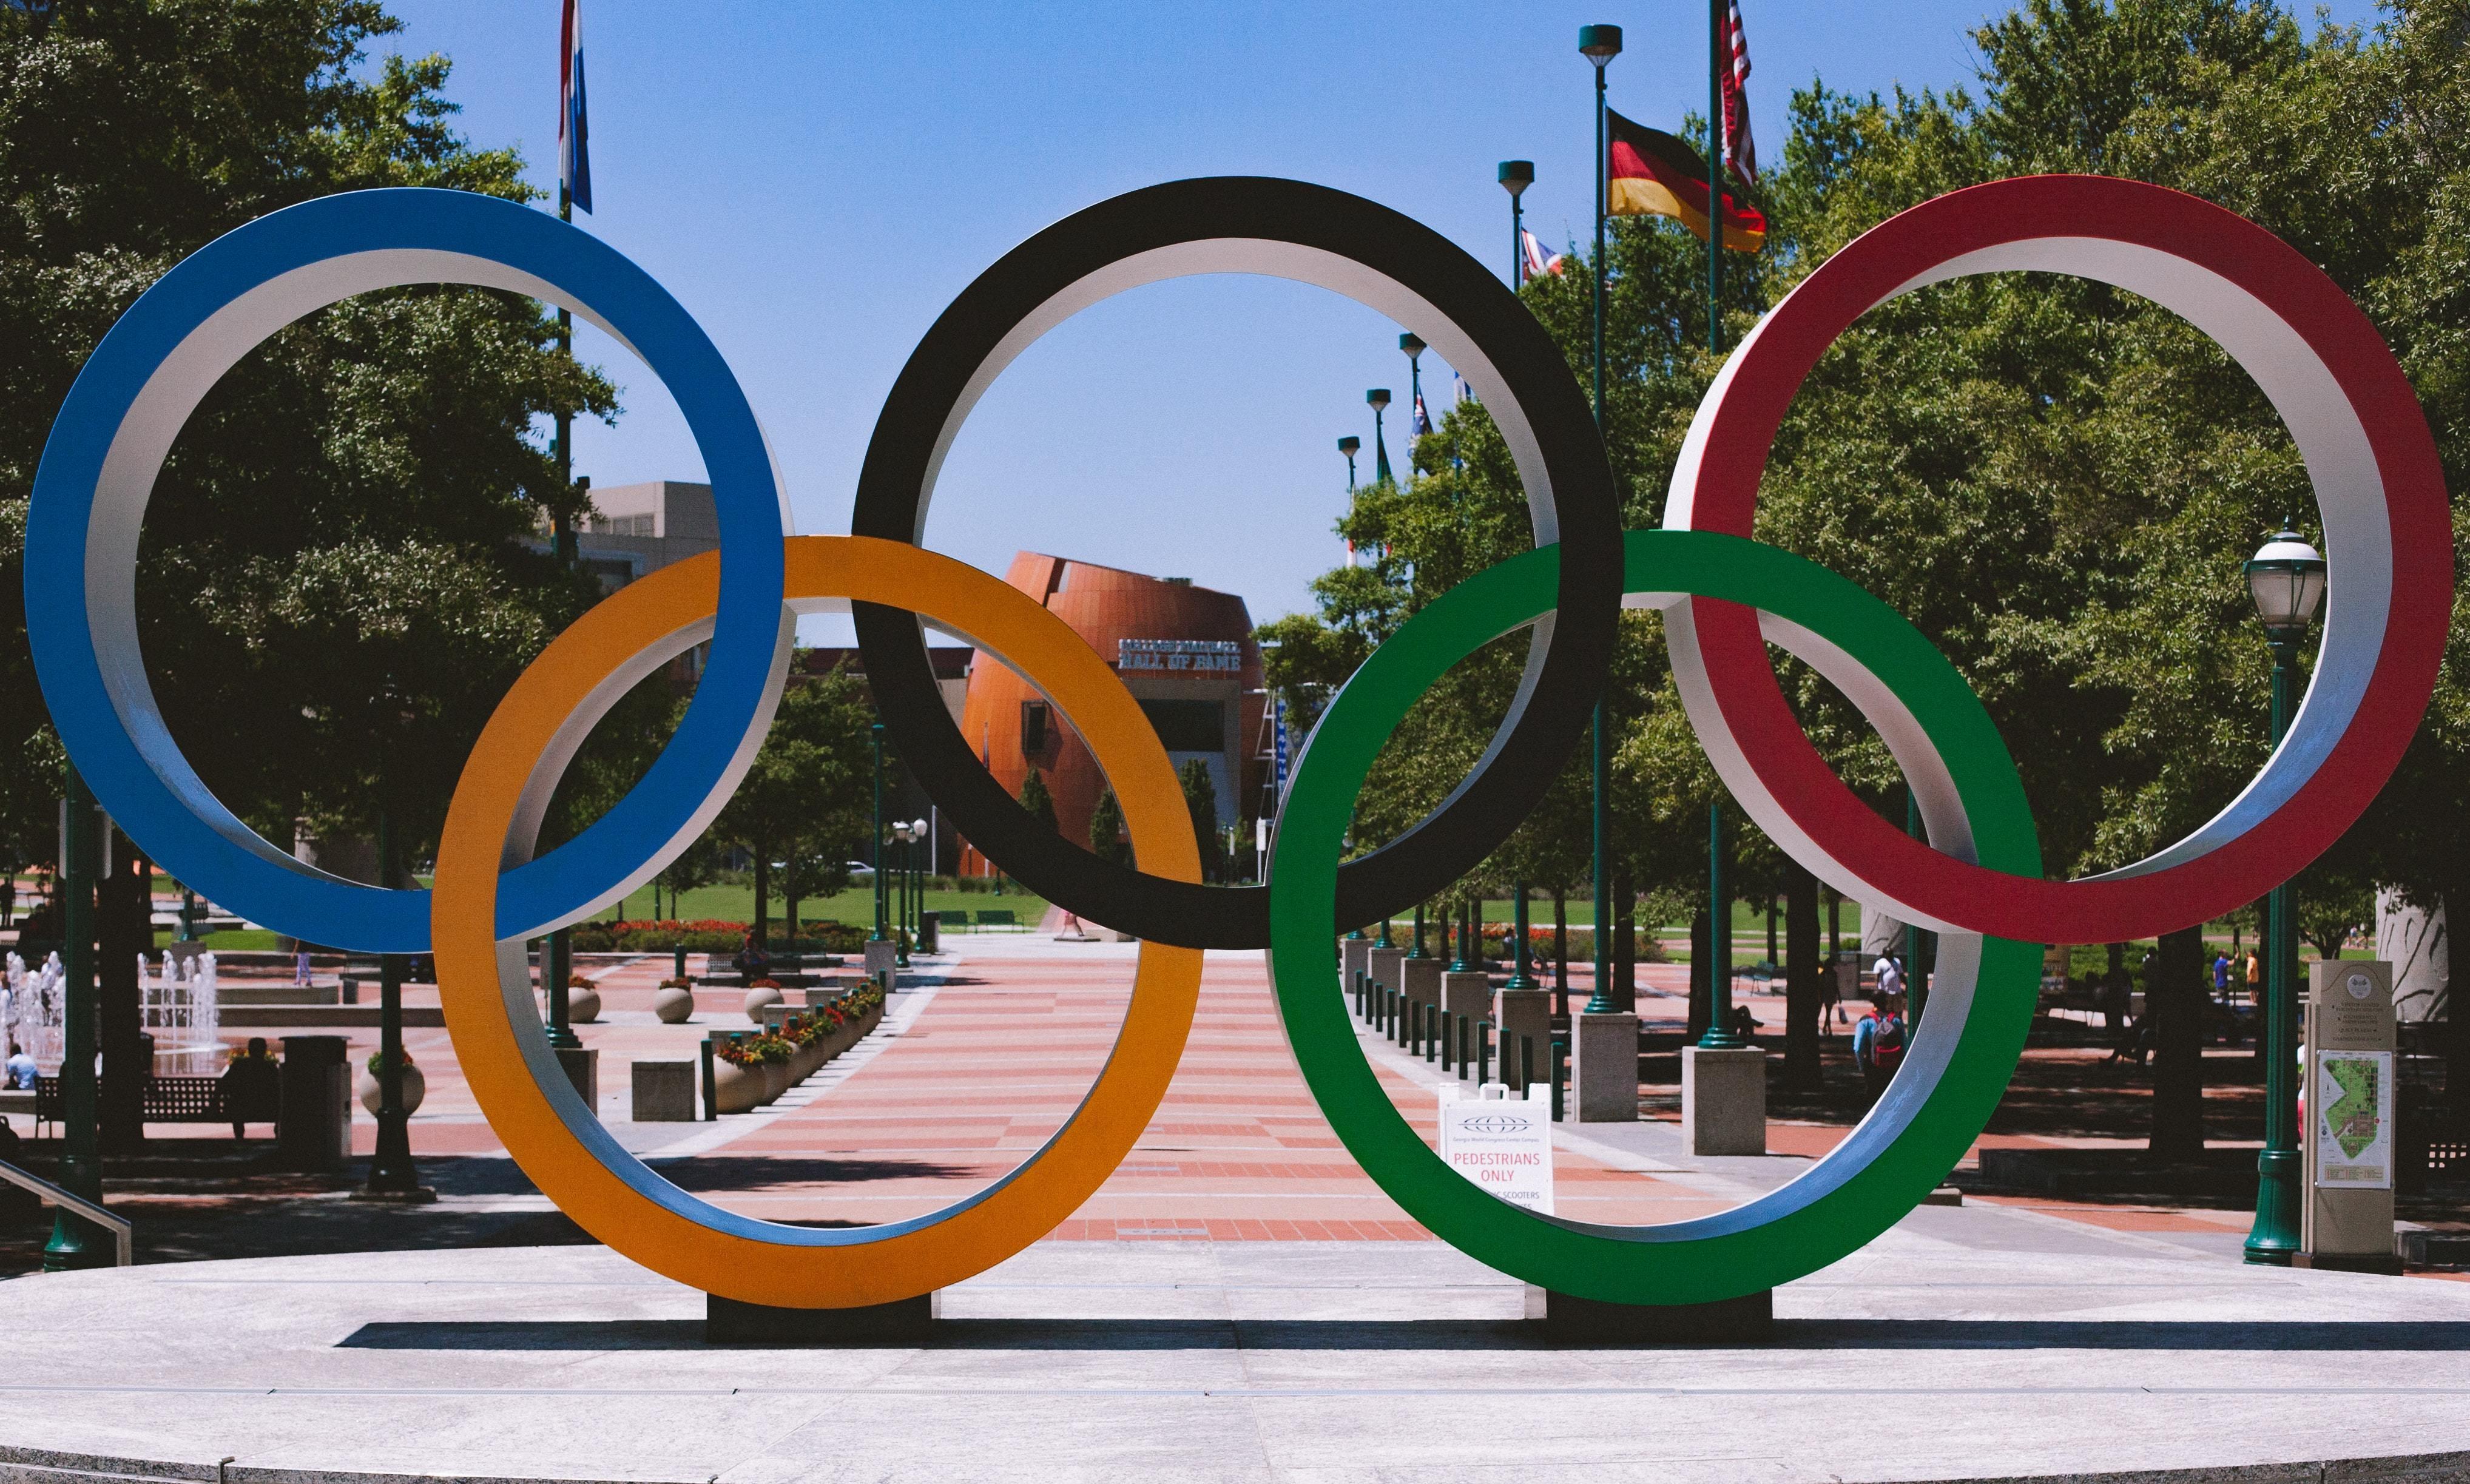 The Olympic symbol.